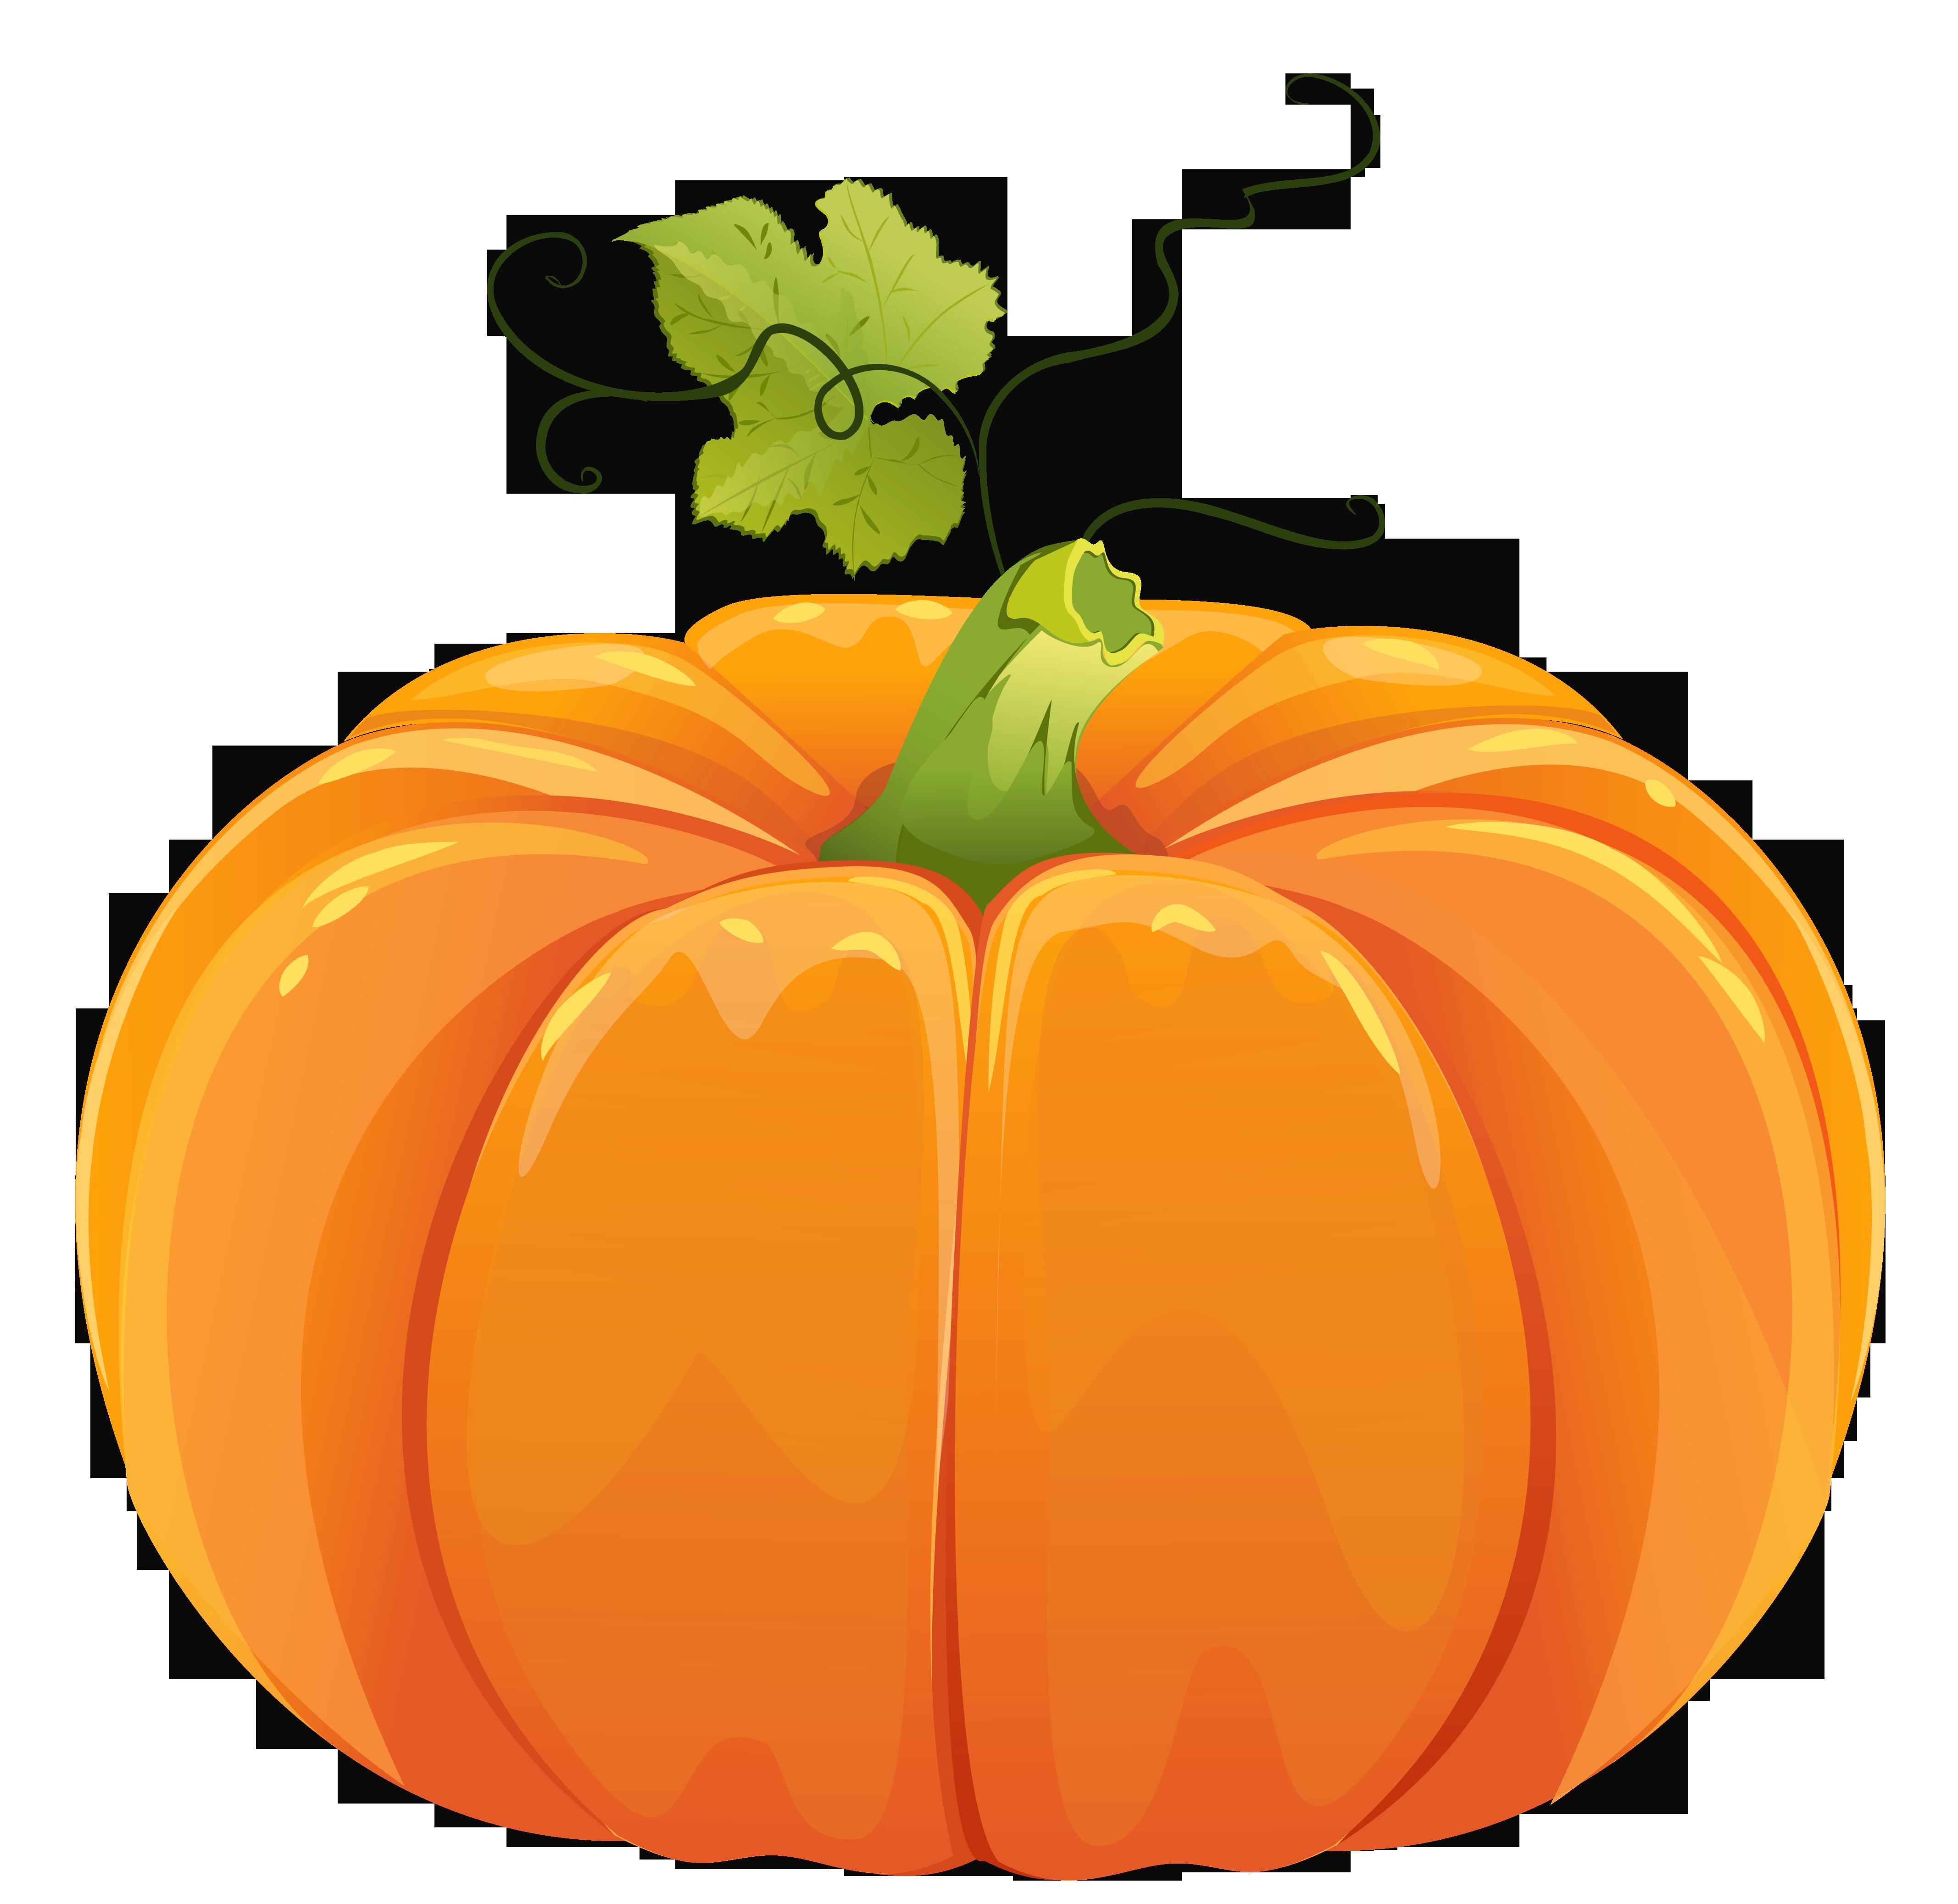 Free Clipart Pumpkins - clipa - Free Clipart Pumpkins